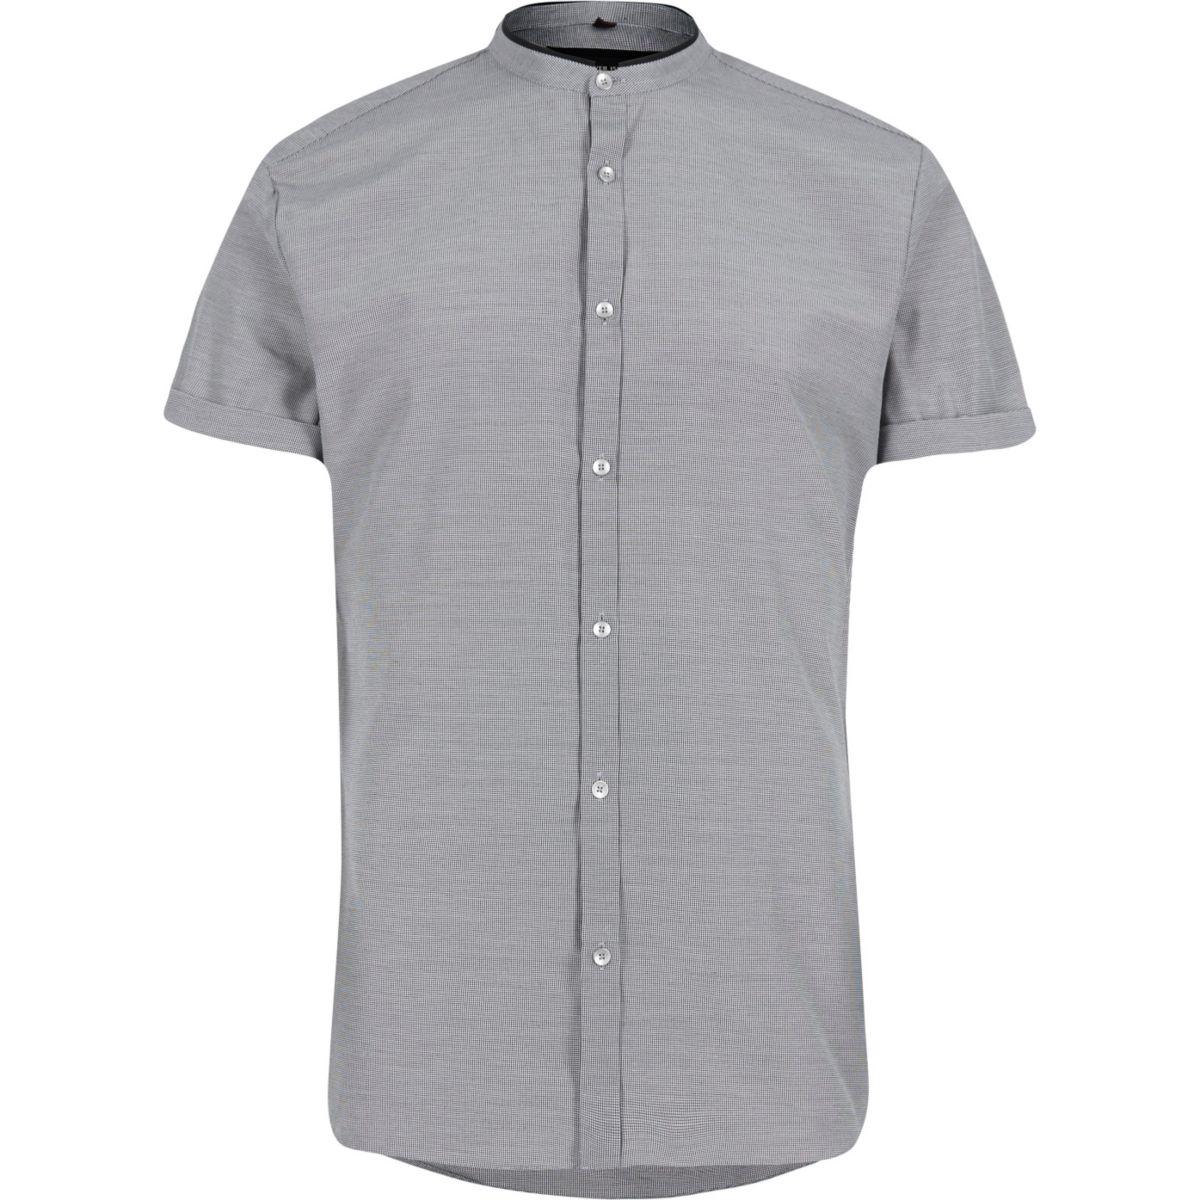 Black houndstooth slim fit grandad shirt